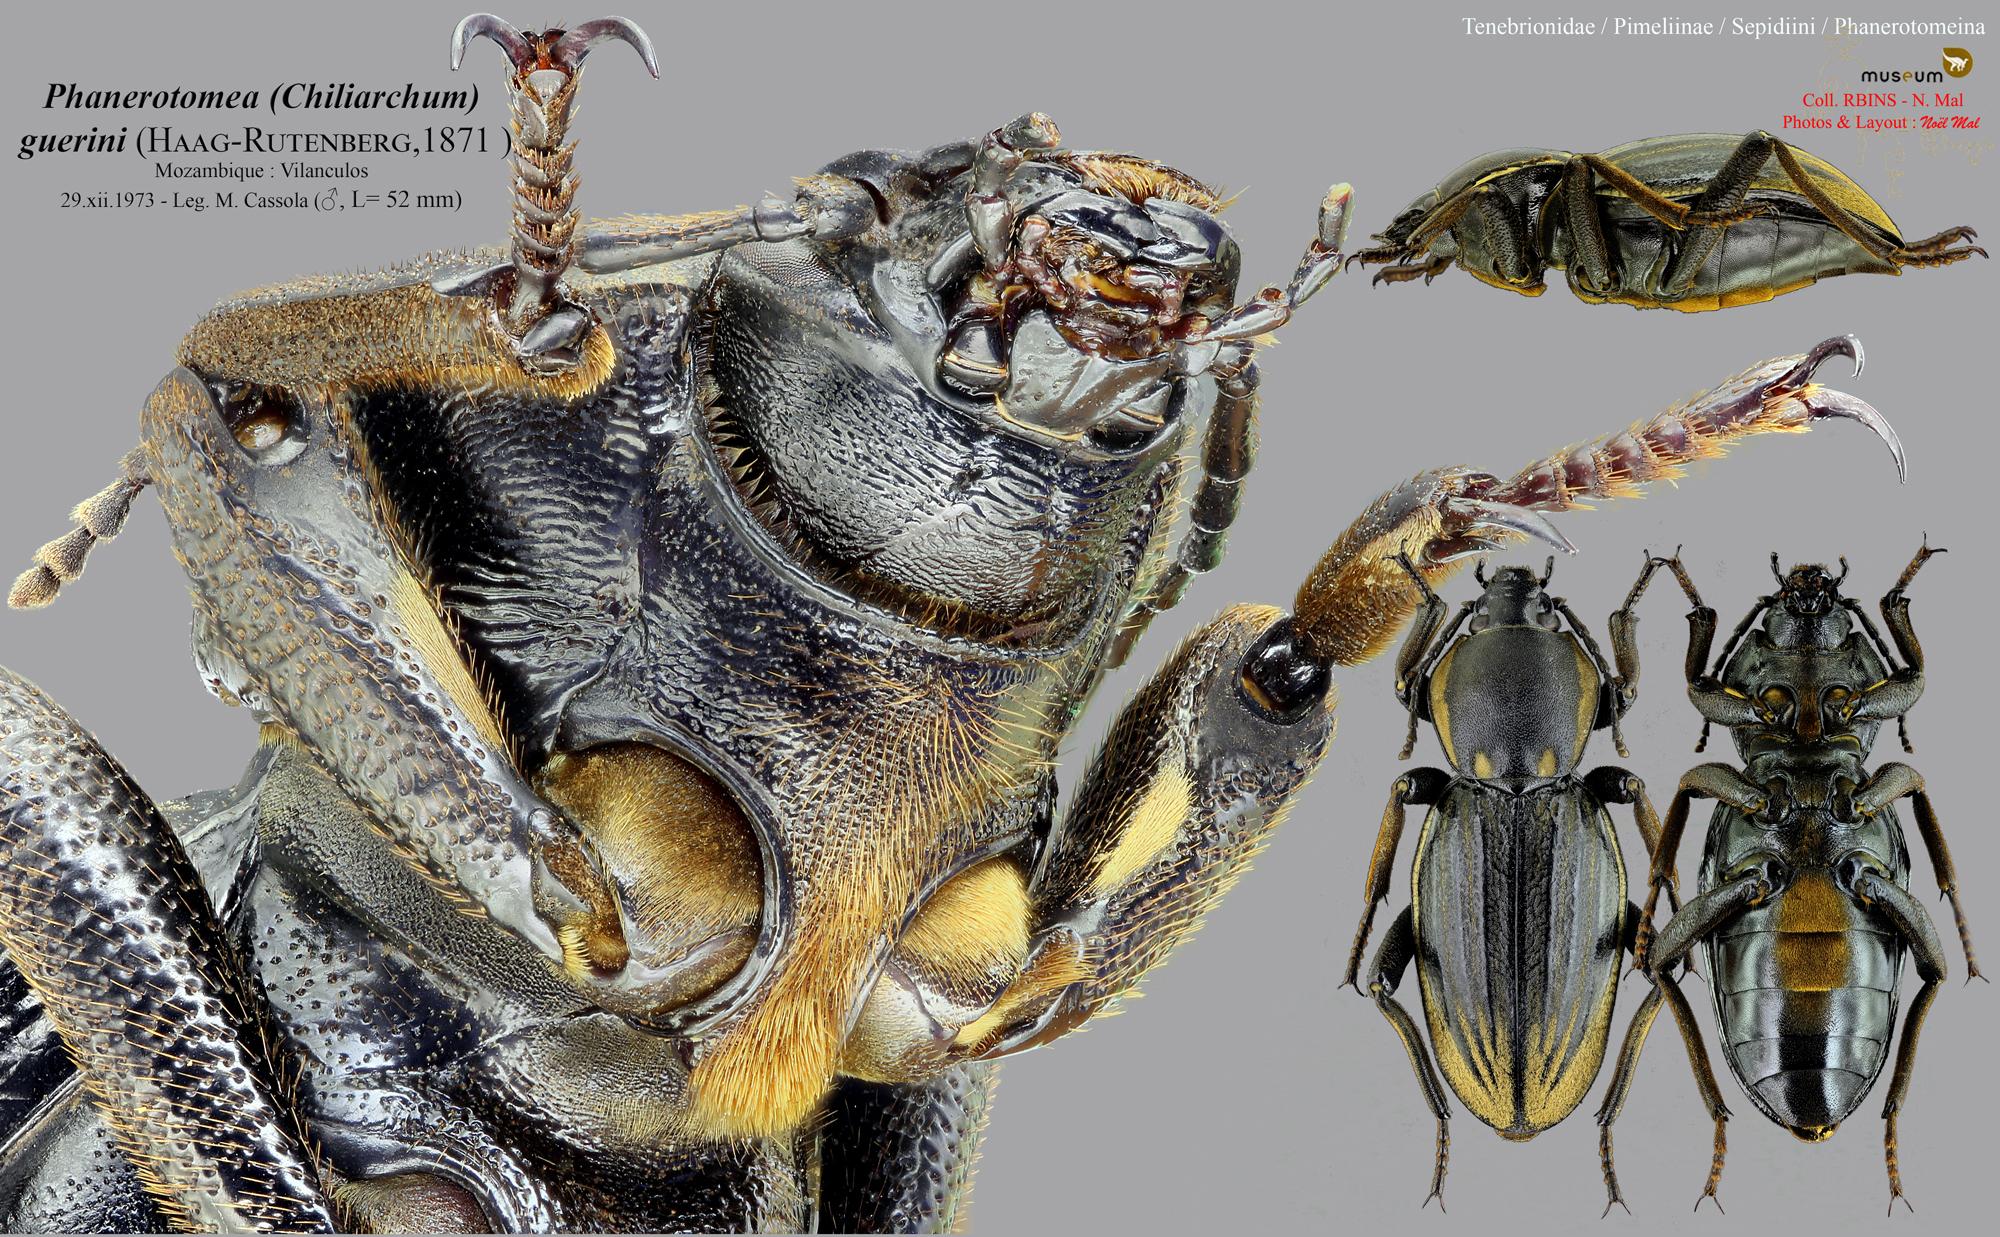 Phanerotomea guerini m.jpg